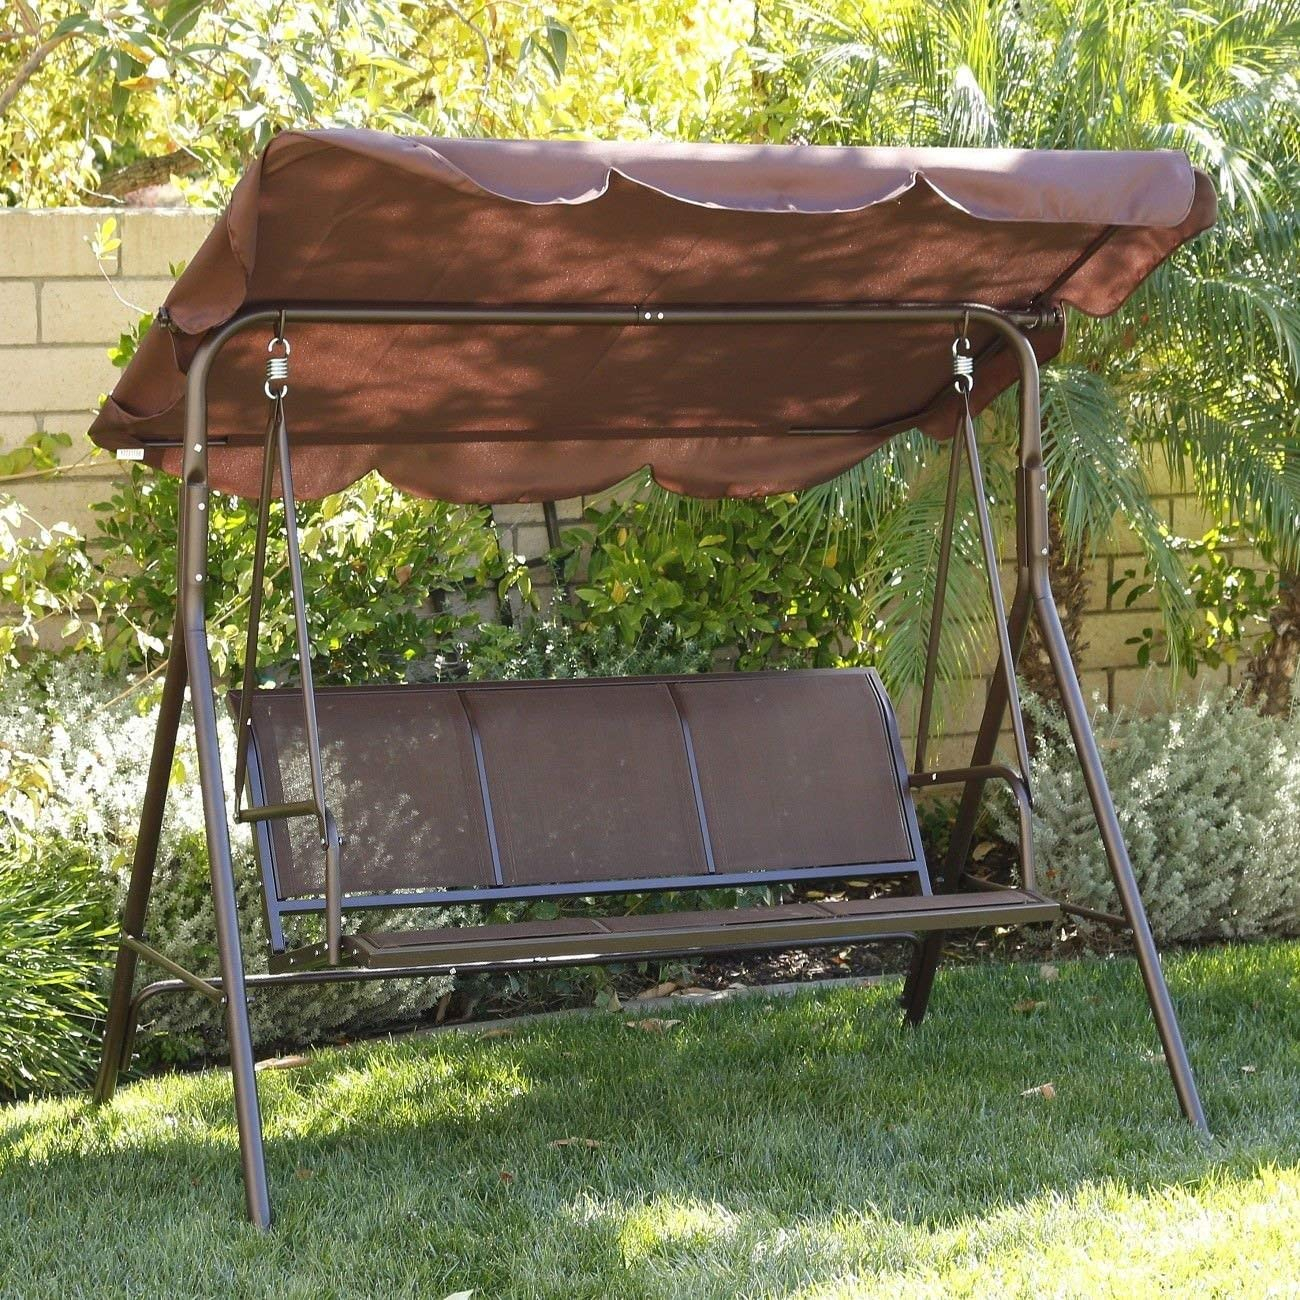 Cheap Steel Frame Swing Set, Find Steel Frame Swing Set With Regard To 3 Person Brown Steel Outdoor Swings (View 24 of 25)